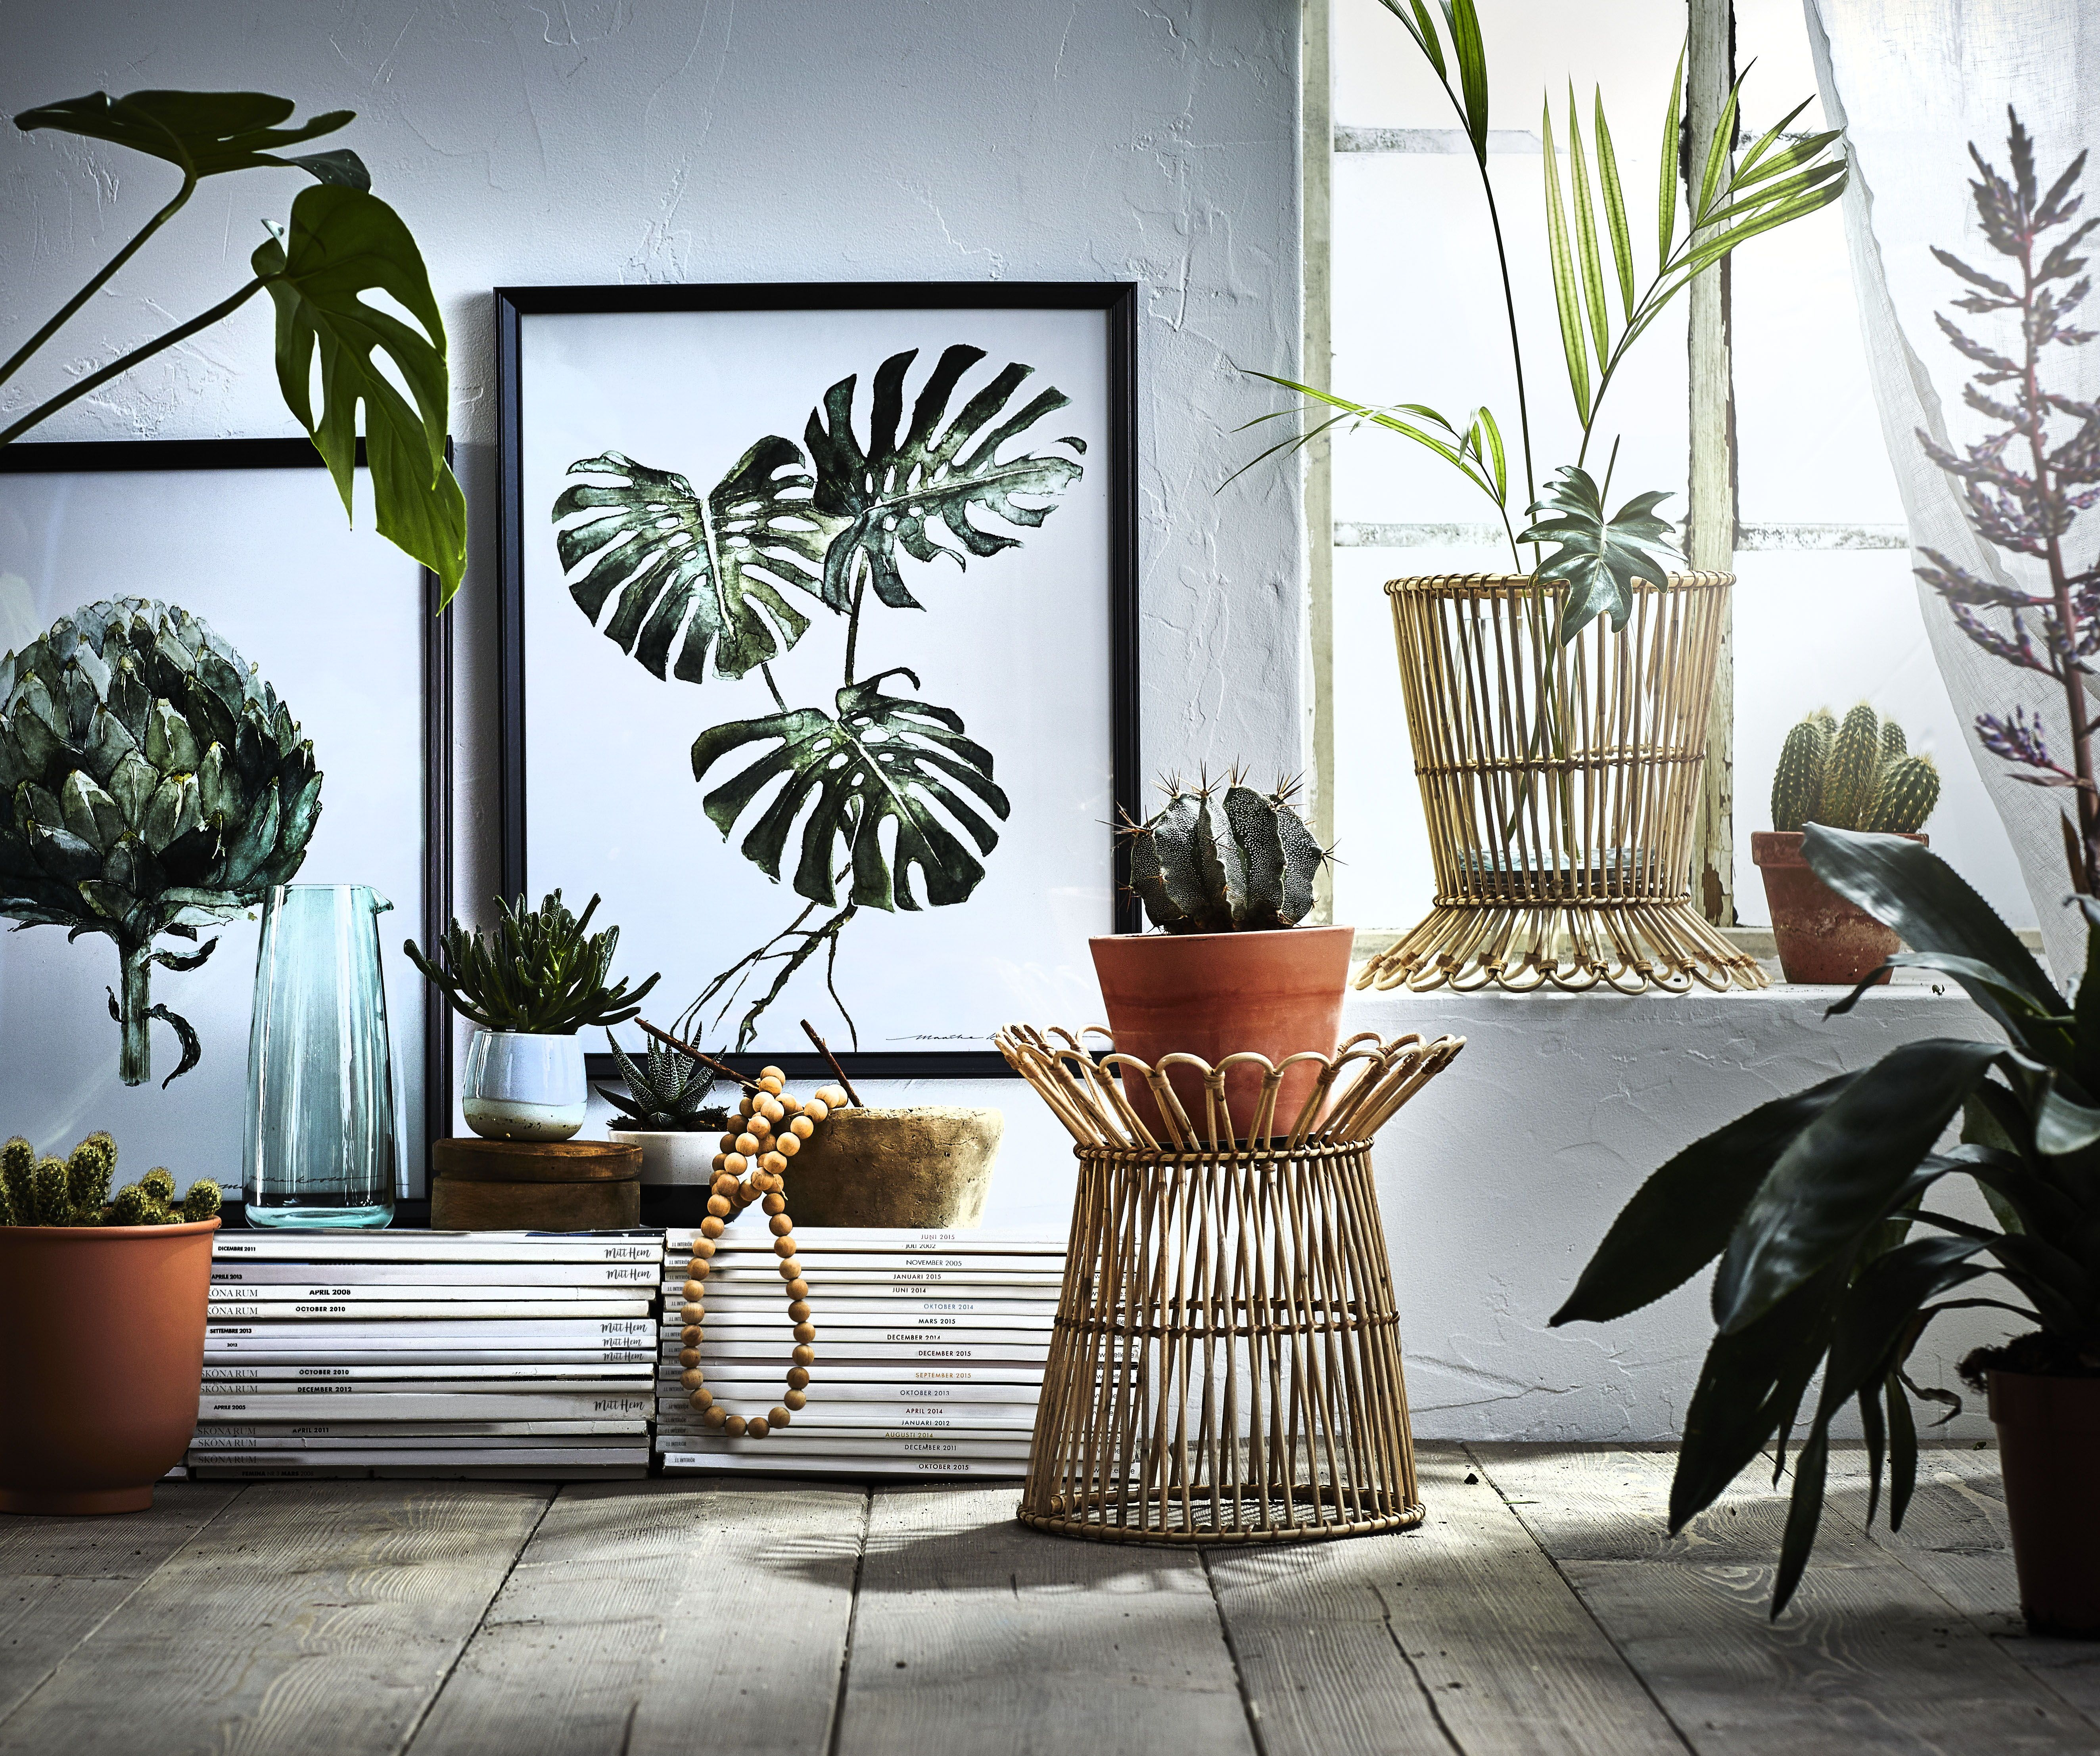 Kanelstang Plantenstandaard Rotan In 2018 Home Ikea Decoration